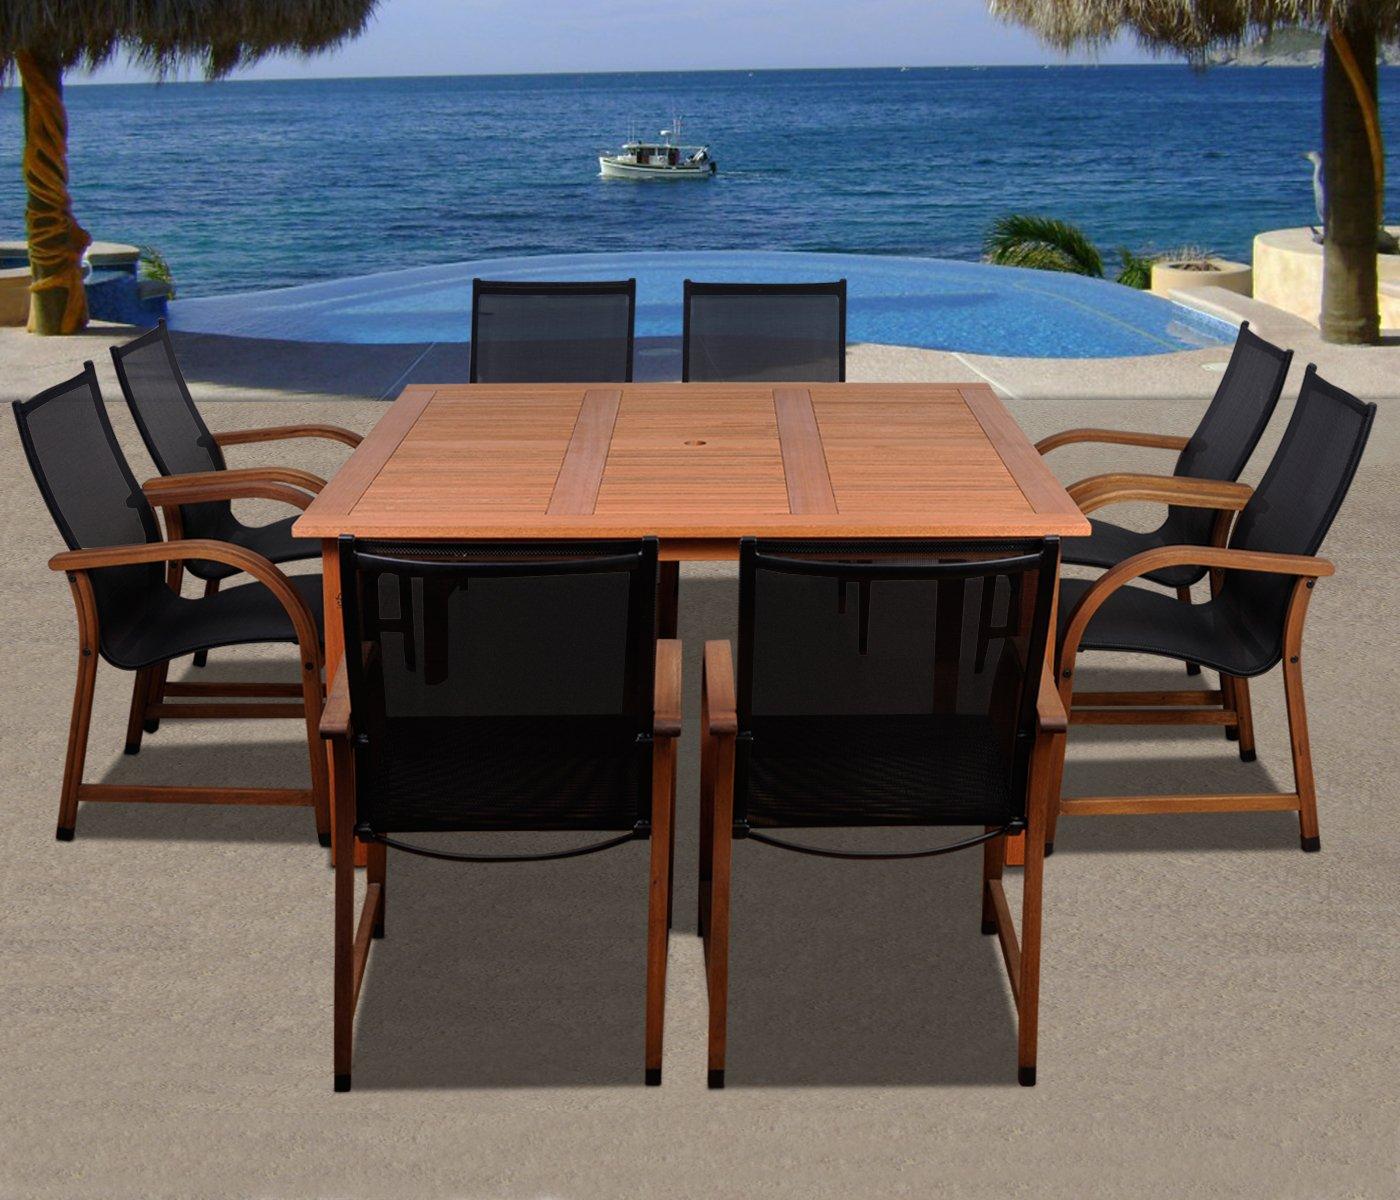 Amazon.com: Amazonia Bahamas 9 Piece Eucalyptus Square Dining Set: Garden U0026  Outdoor